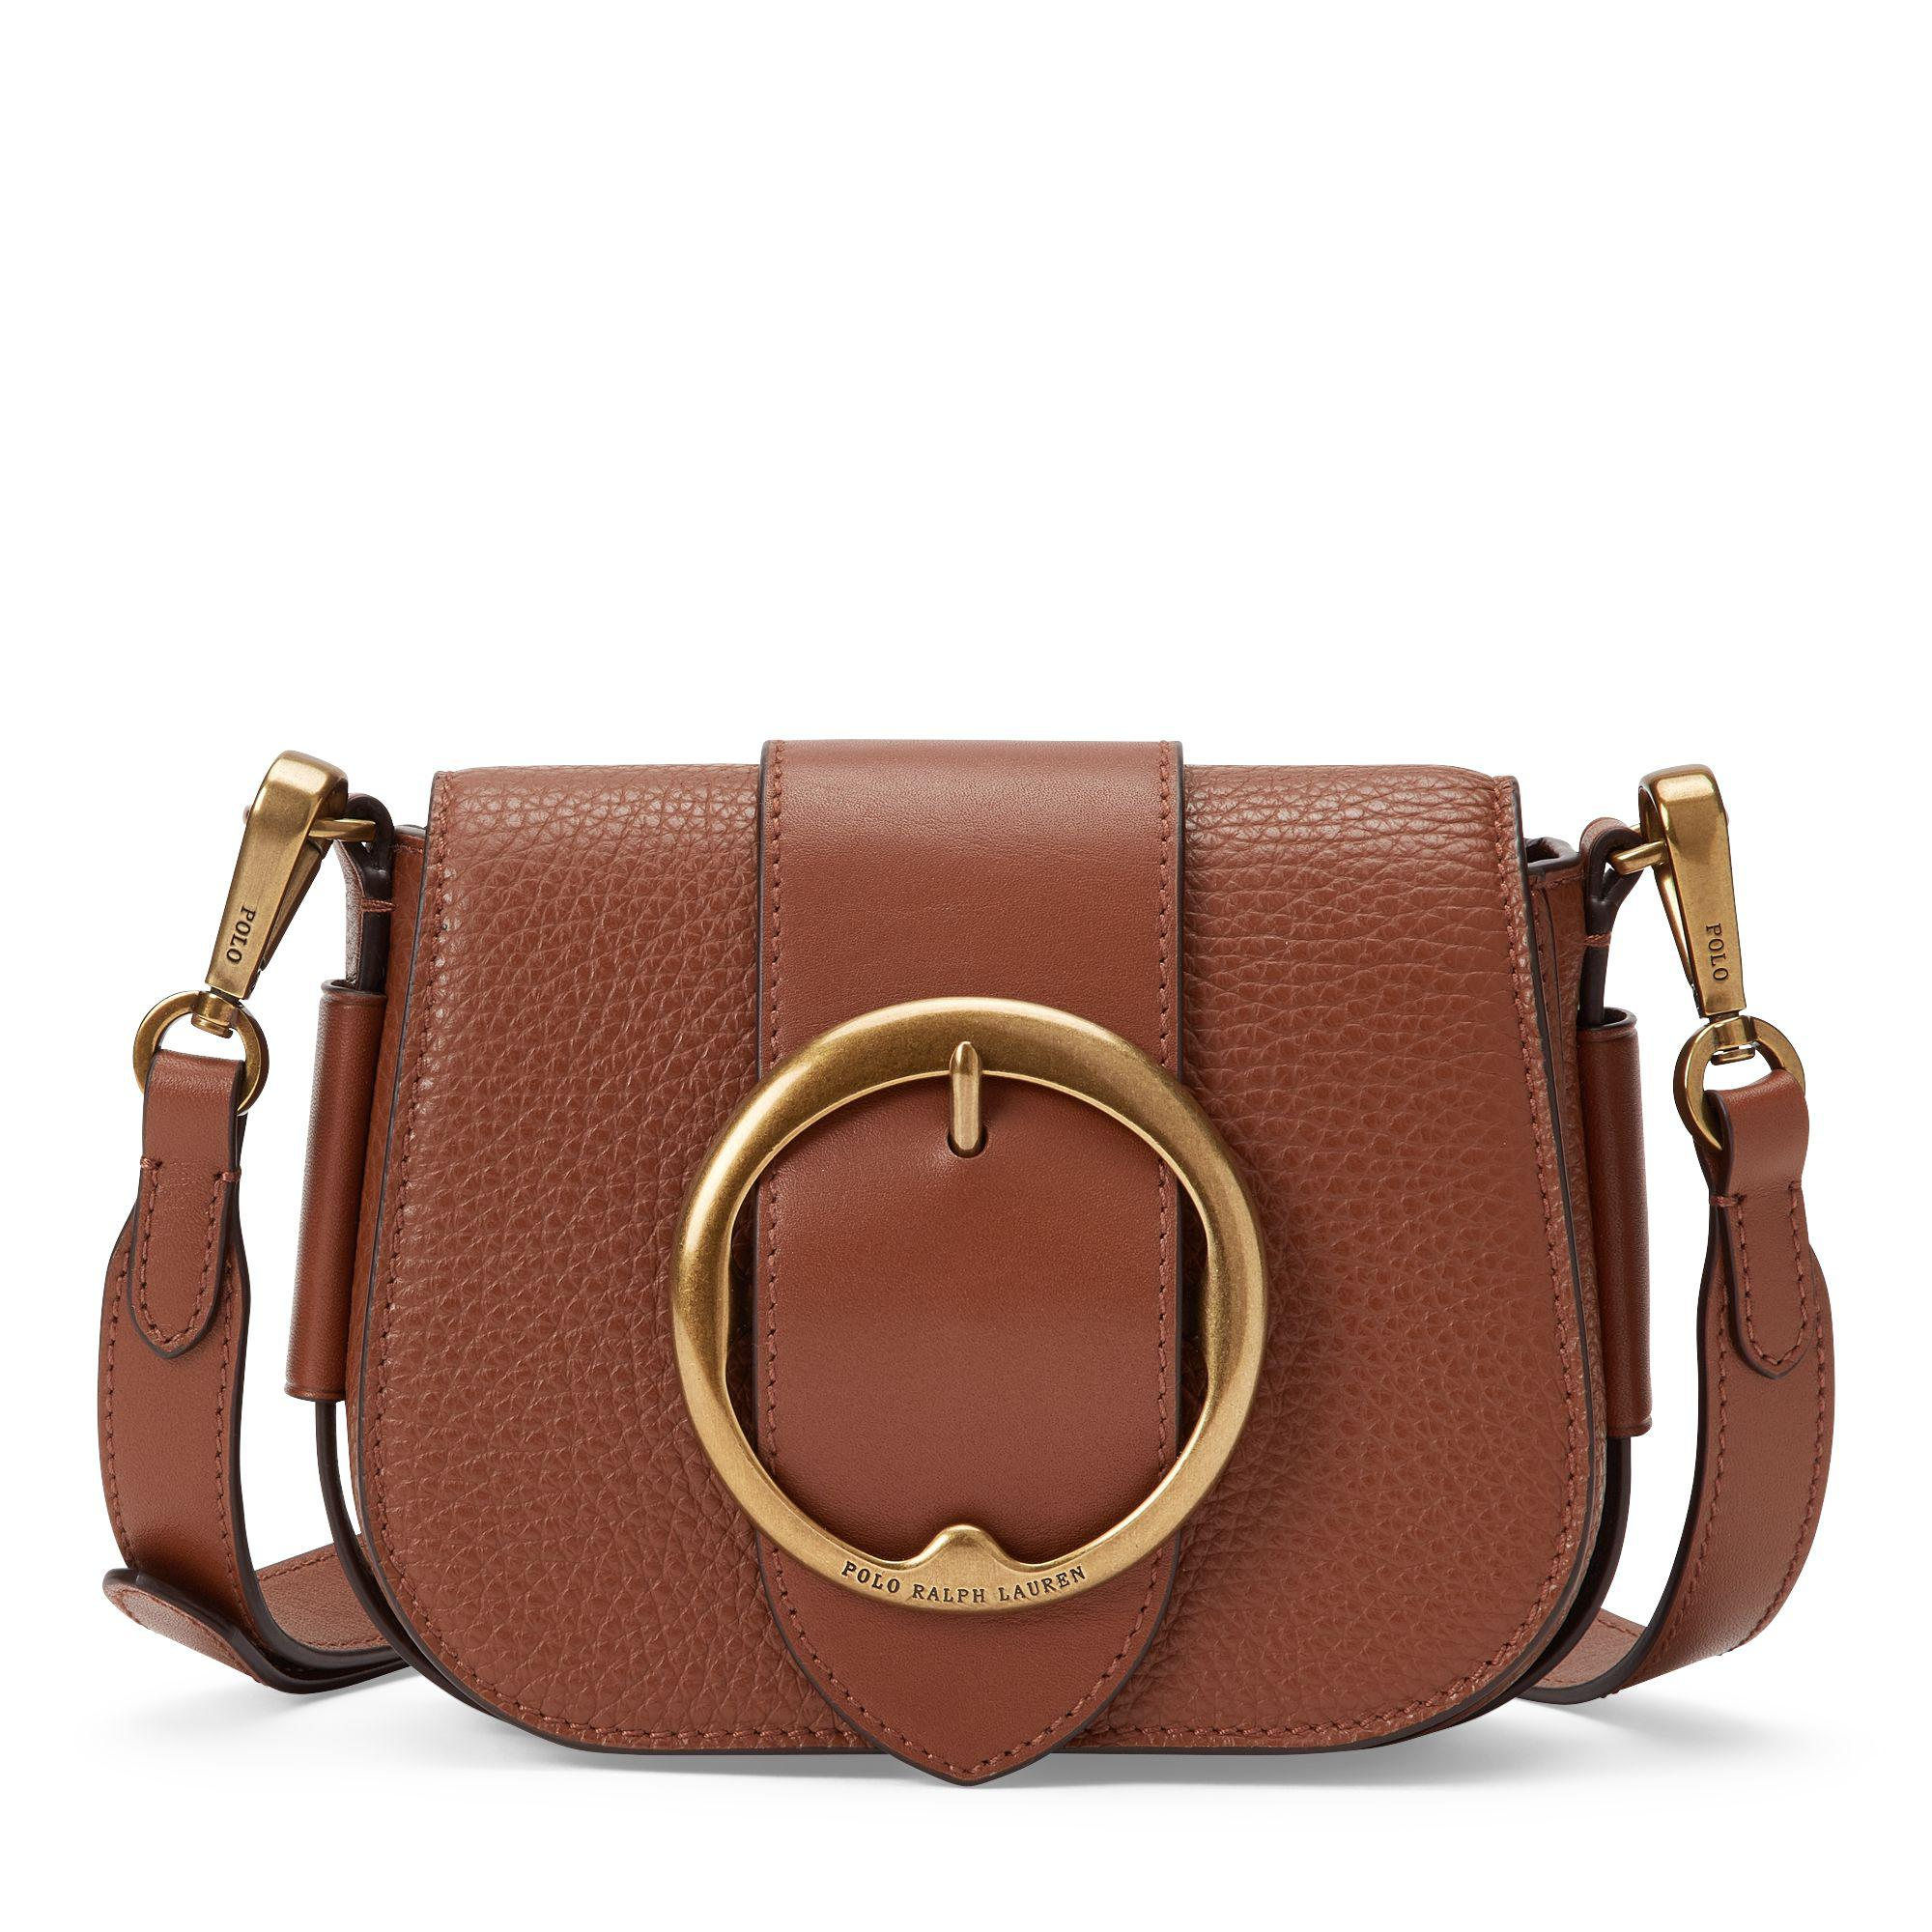 d91bb31eeb4a Polo Ralph Lauren Leather Mini Lennox Bag in Brown - Lyst